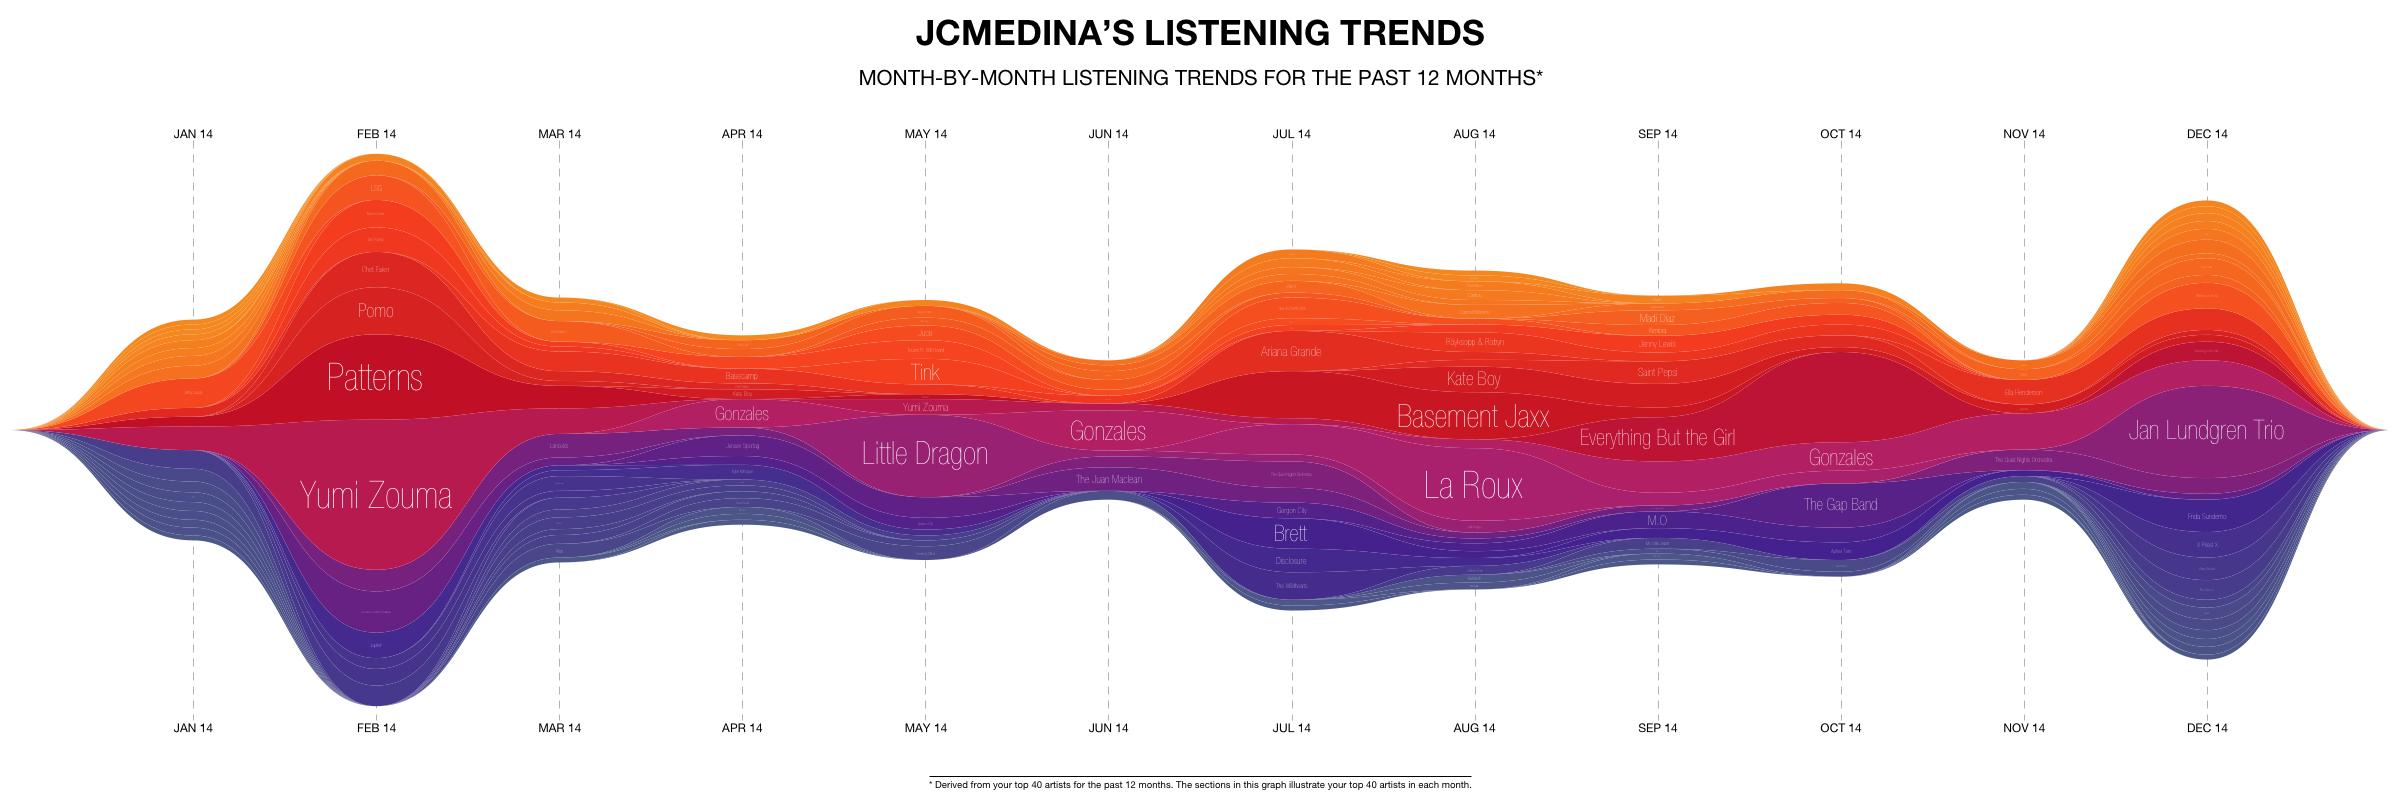 jcmedina_listening_trends__5_